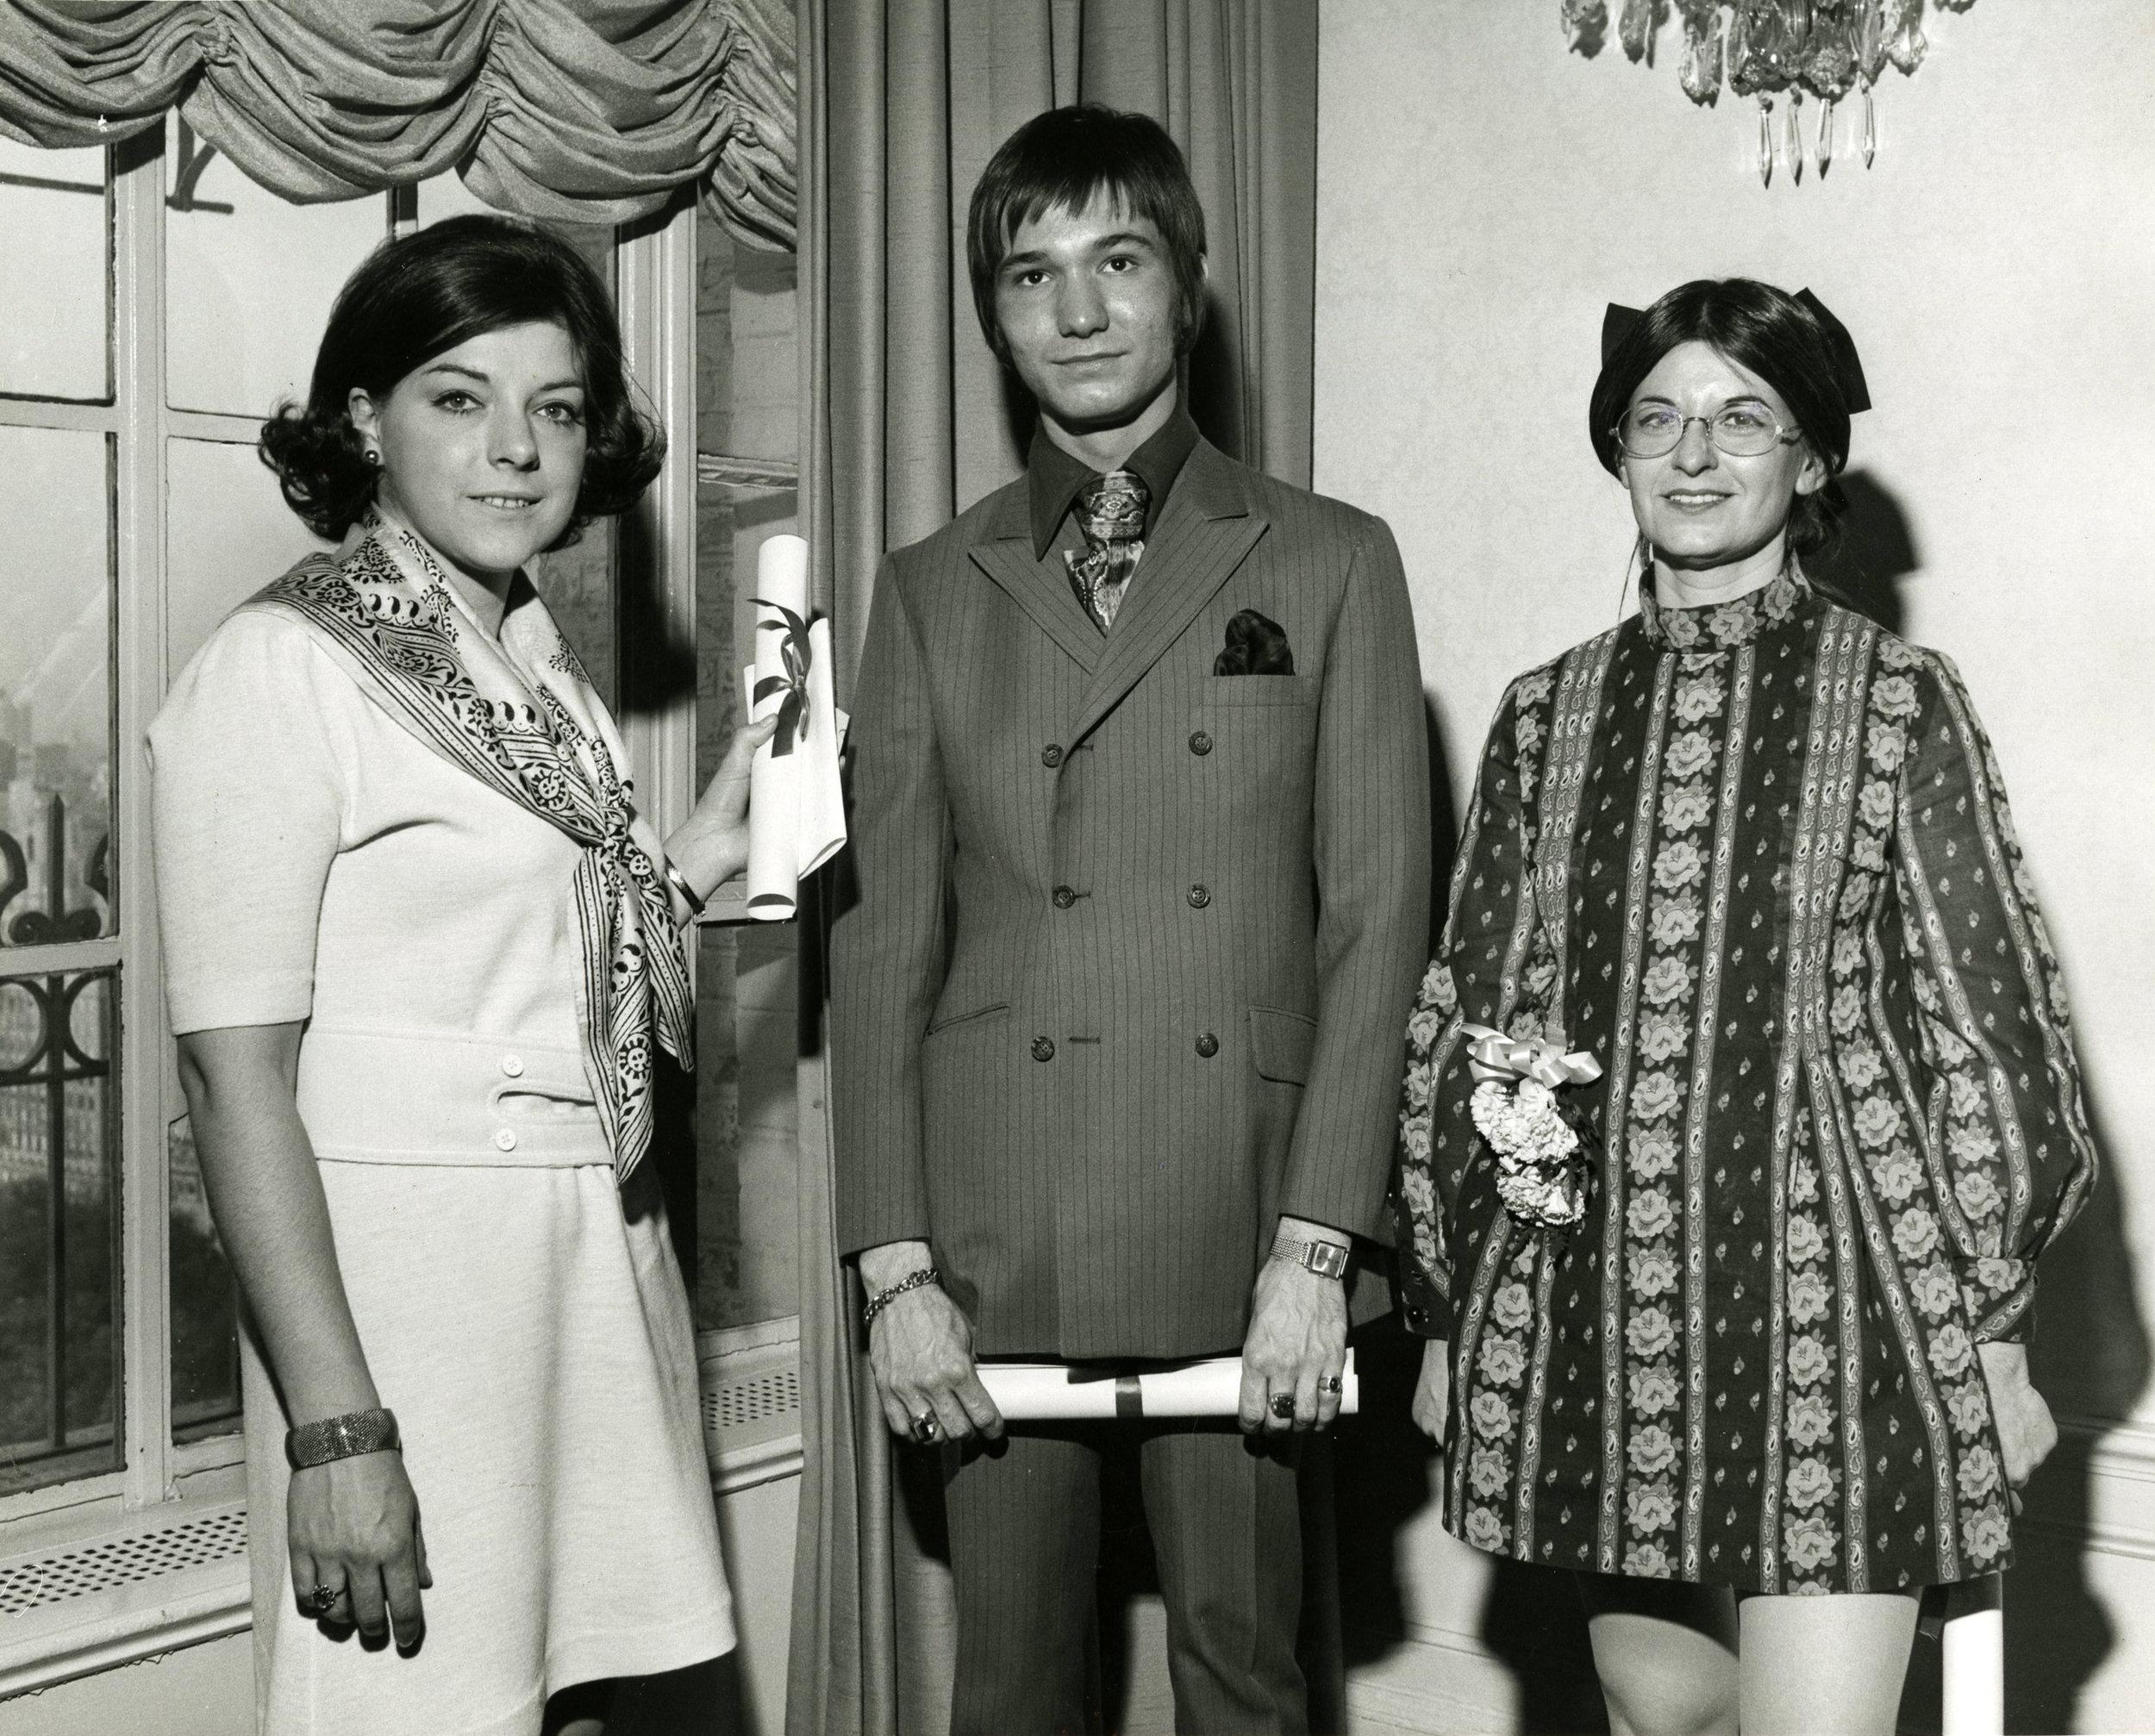 nysid-alumna-mariette-himes-gomez-left-with-fellow-graduates-1969_24460060906_o.jpg